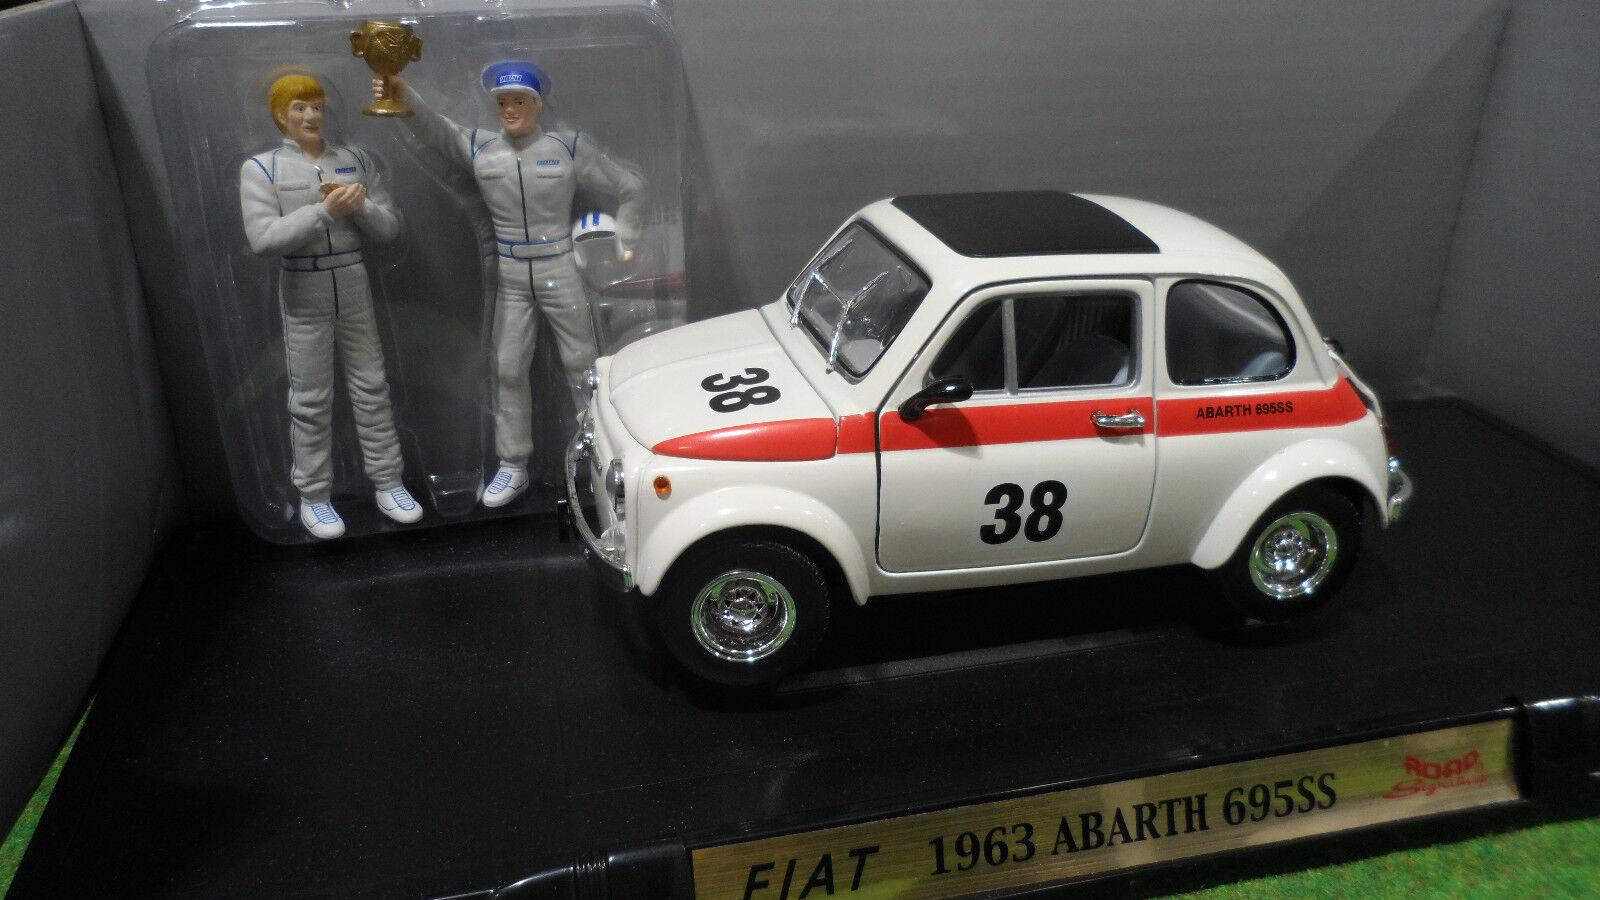 FIAT ABARTH 695SS   38 + 2 FIGURINES 1 18 ROAD SIGNATURE 92338 voiture miniature